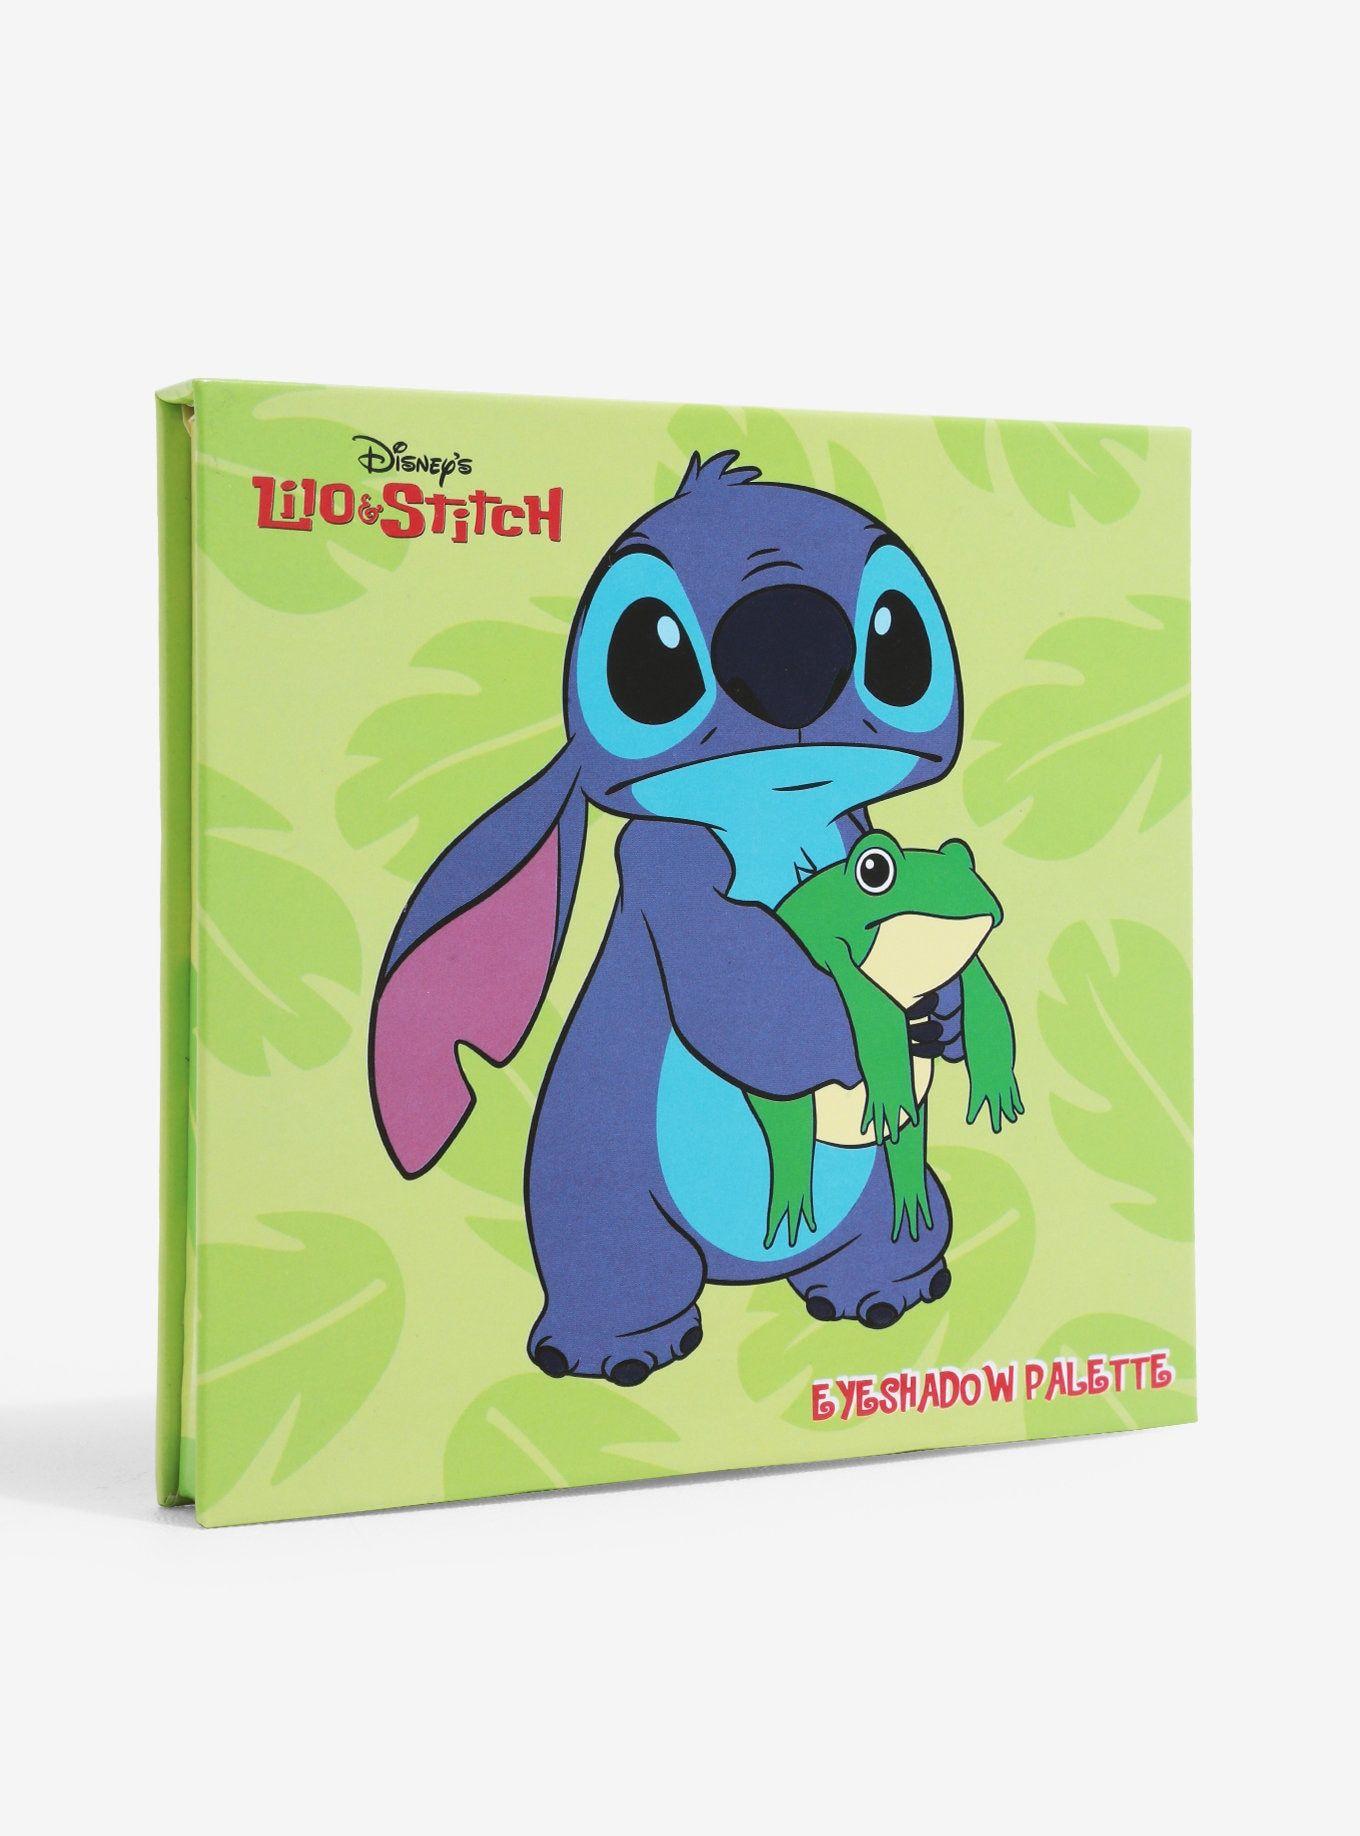 Disney Lilo & Stitch Frog 12 Eyeshadow Palette in 2020